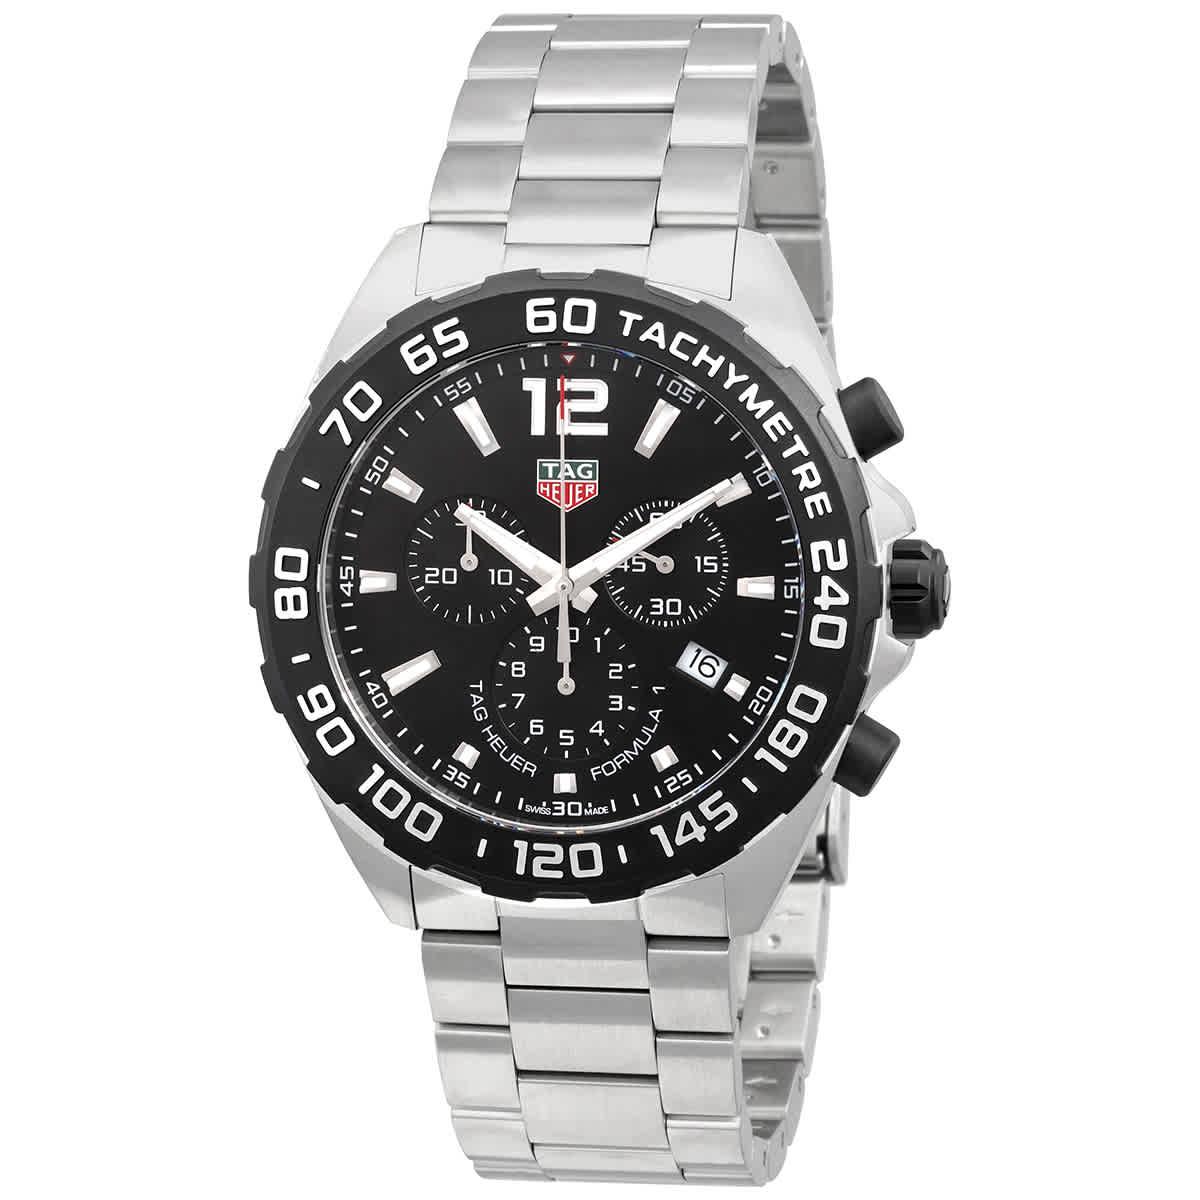 cdb8d49c782 Tag Heuer Formula 1 Chronograph Black Dial Men s Watch CAZ1010.BA0842